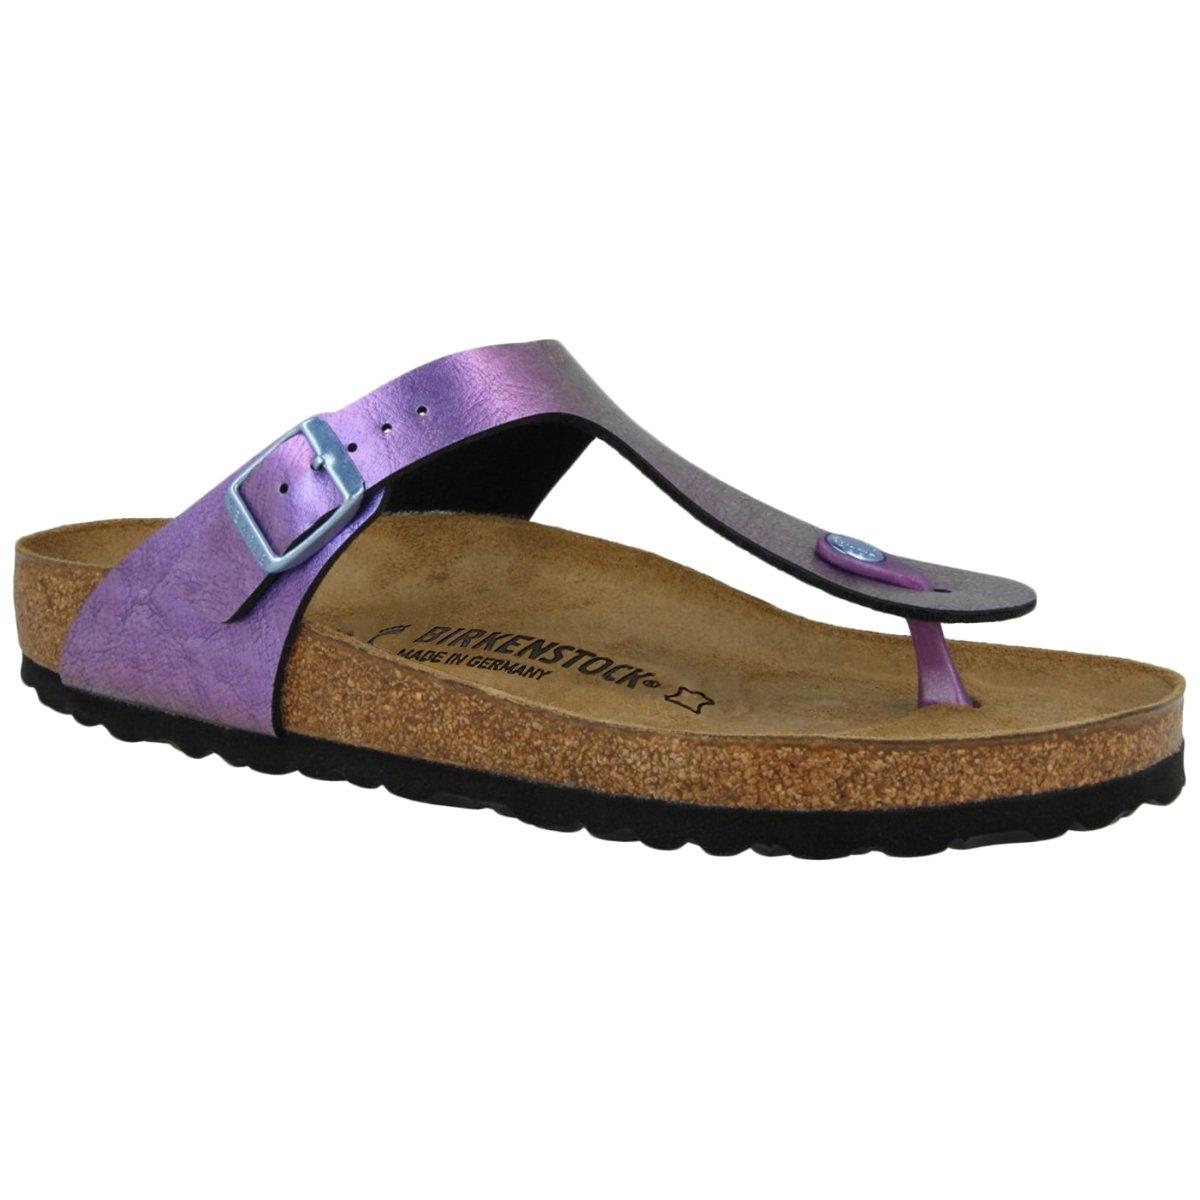 680b35385 Galleon - Birkenstock Unisex Gizeh Birko-Flor Graceful GEMM Violet Sandals  6 W   4 M US